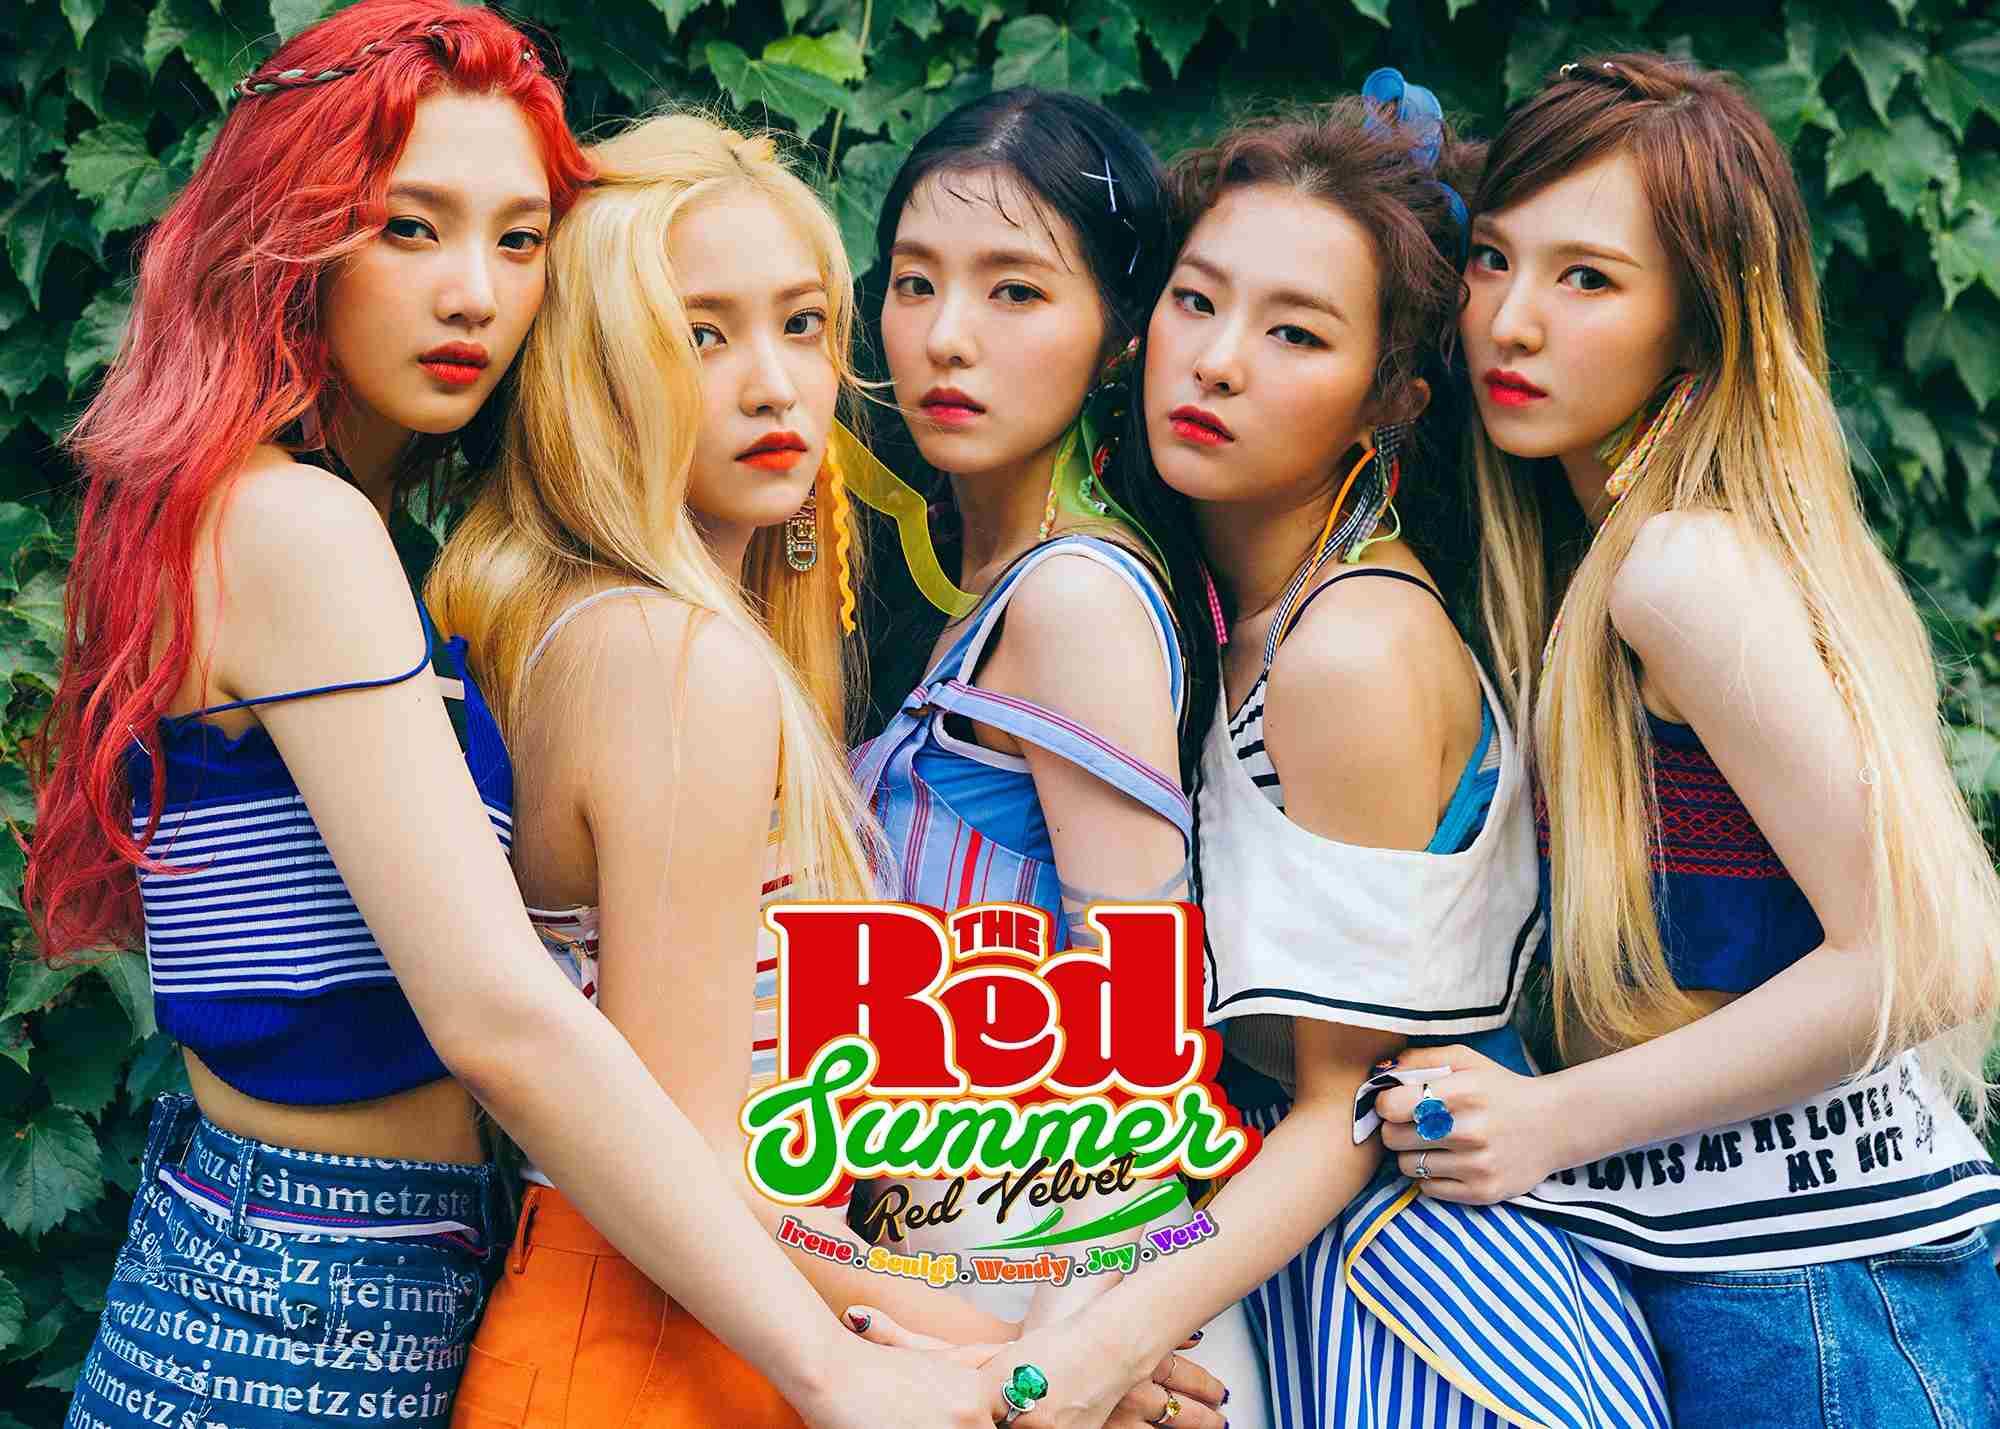 Red Velvet在7月9日帶著迷你專輯《The Red Summer》回歸